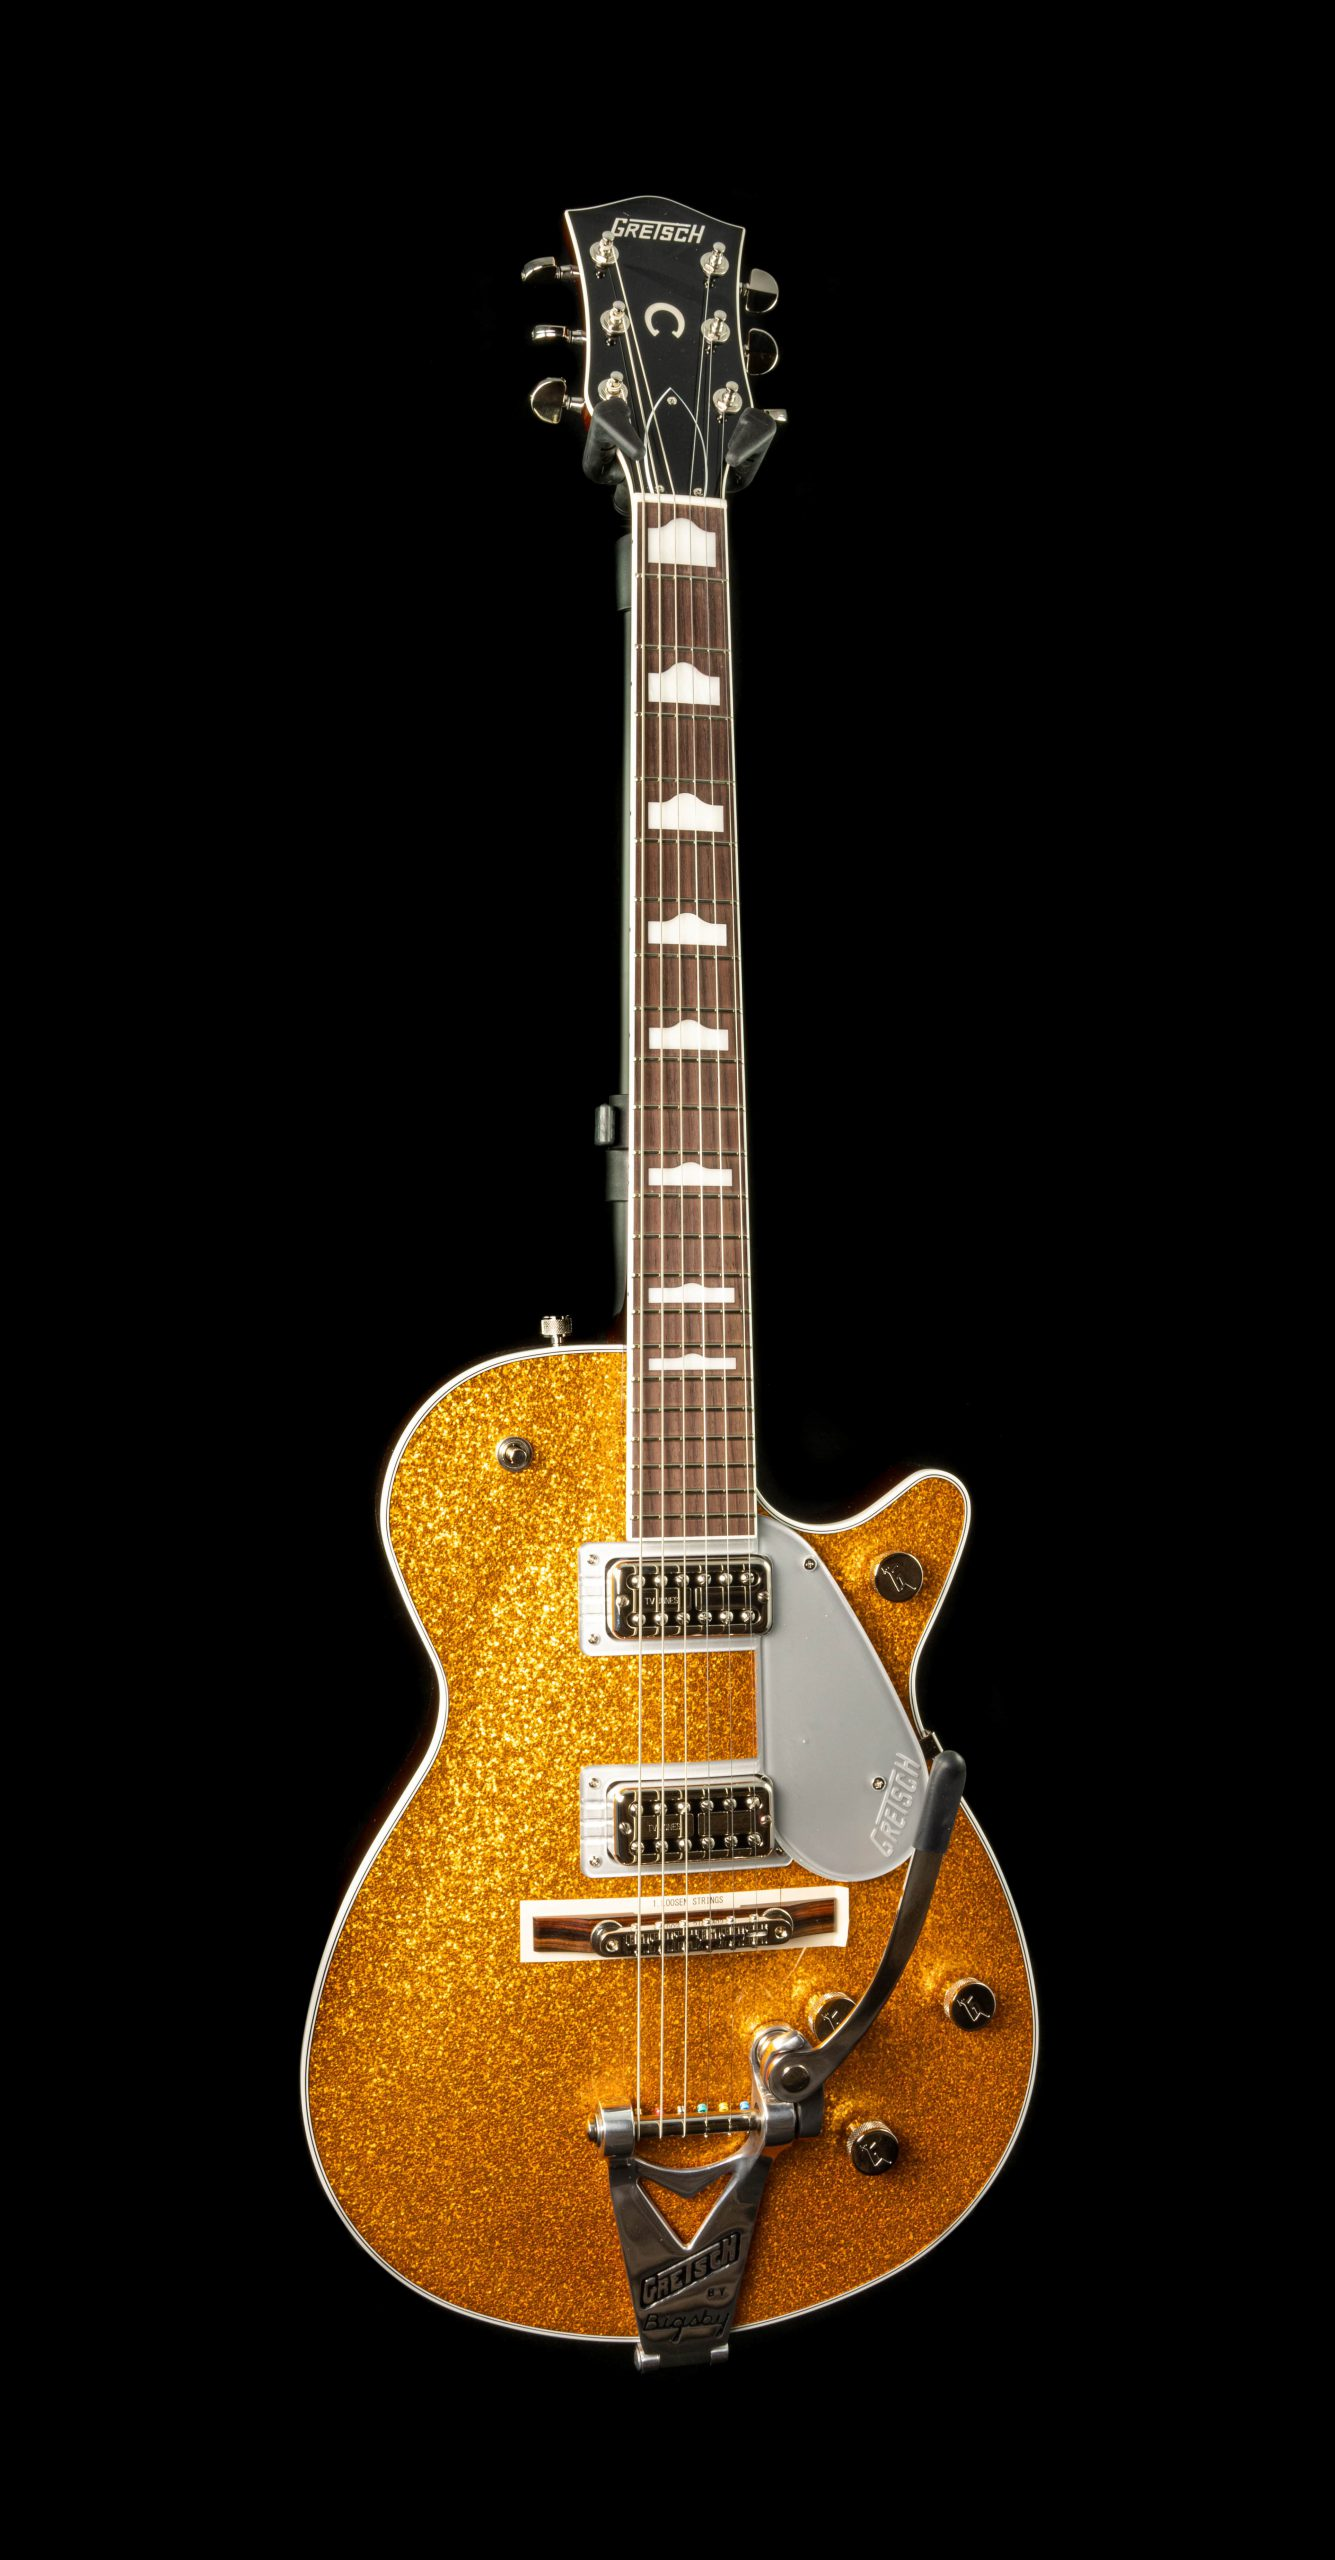 Gretsch G6129T-89 Vintage Select '89 Sparkle Jet in Gold Sparkle